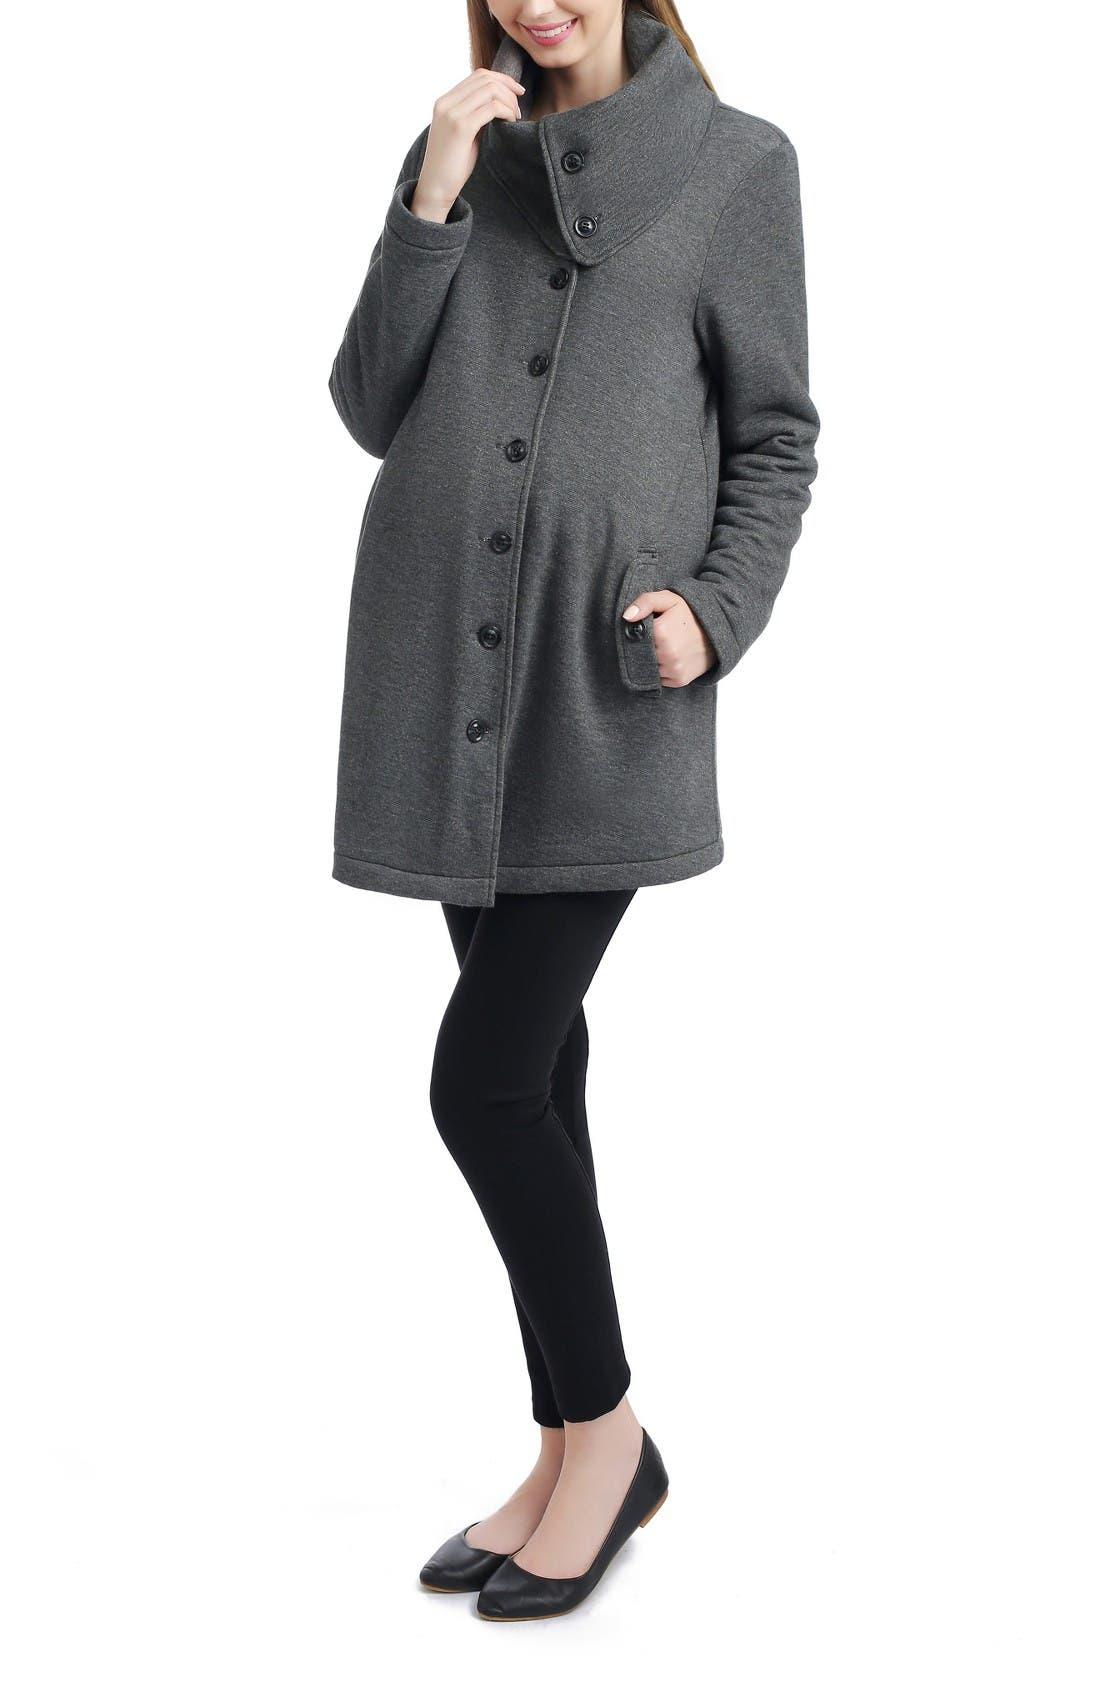 Alternate Image 1 Selected - Kimi and Kai Abella Maternity Sweatshirt Jacket